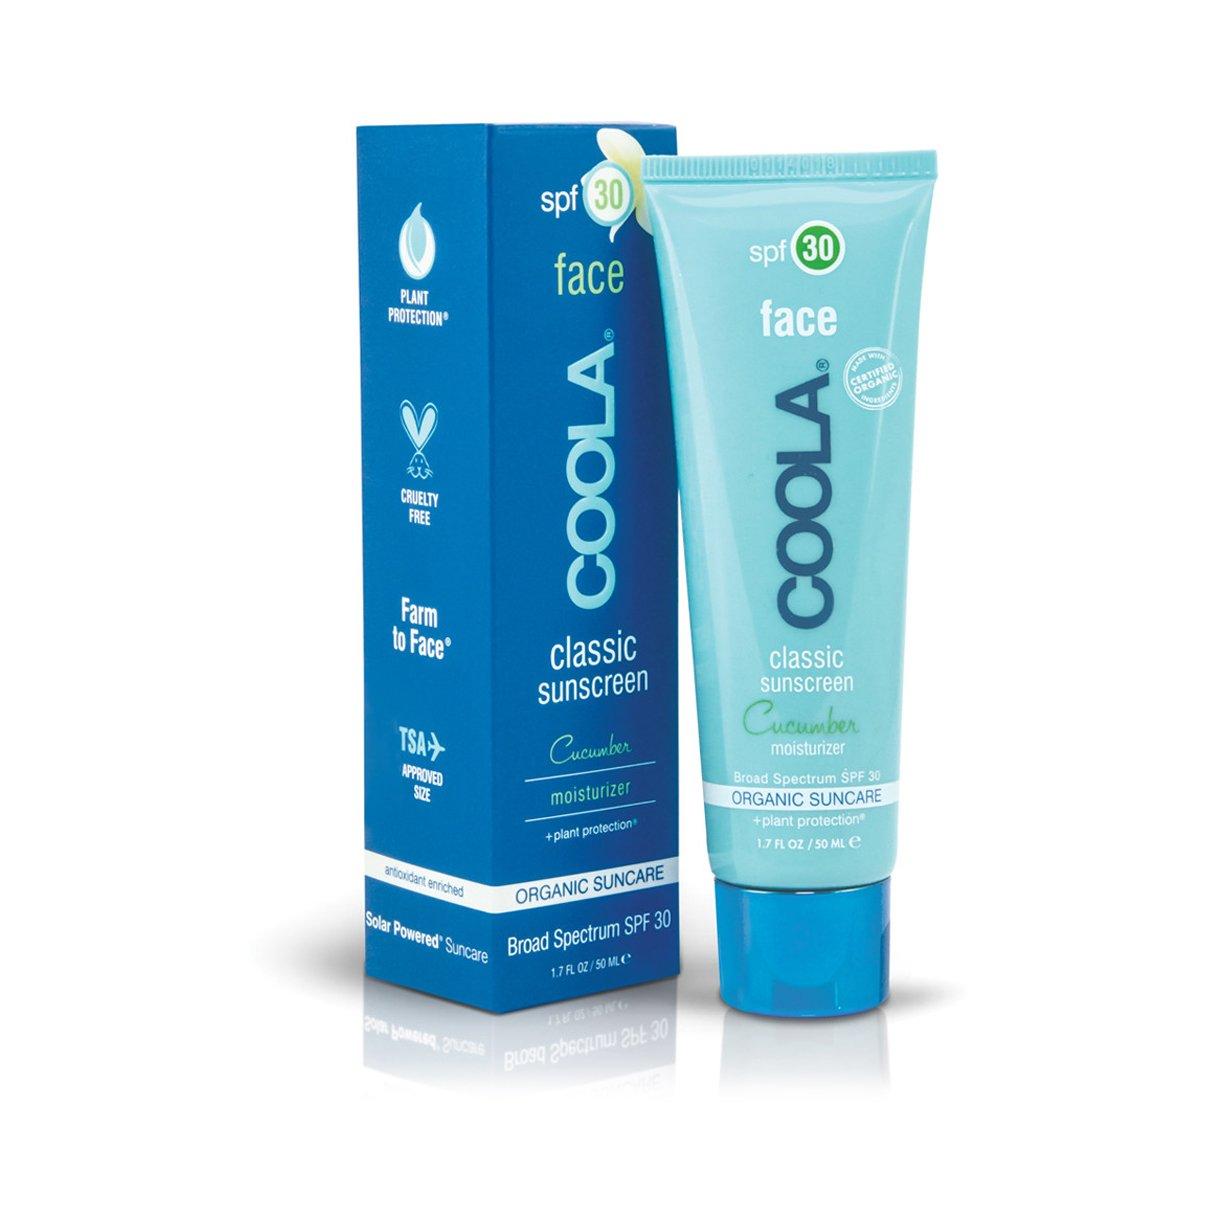 Coola Moisturizing Face Spf 30 Organic Sunscreen Lotion